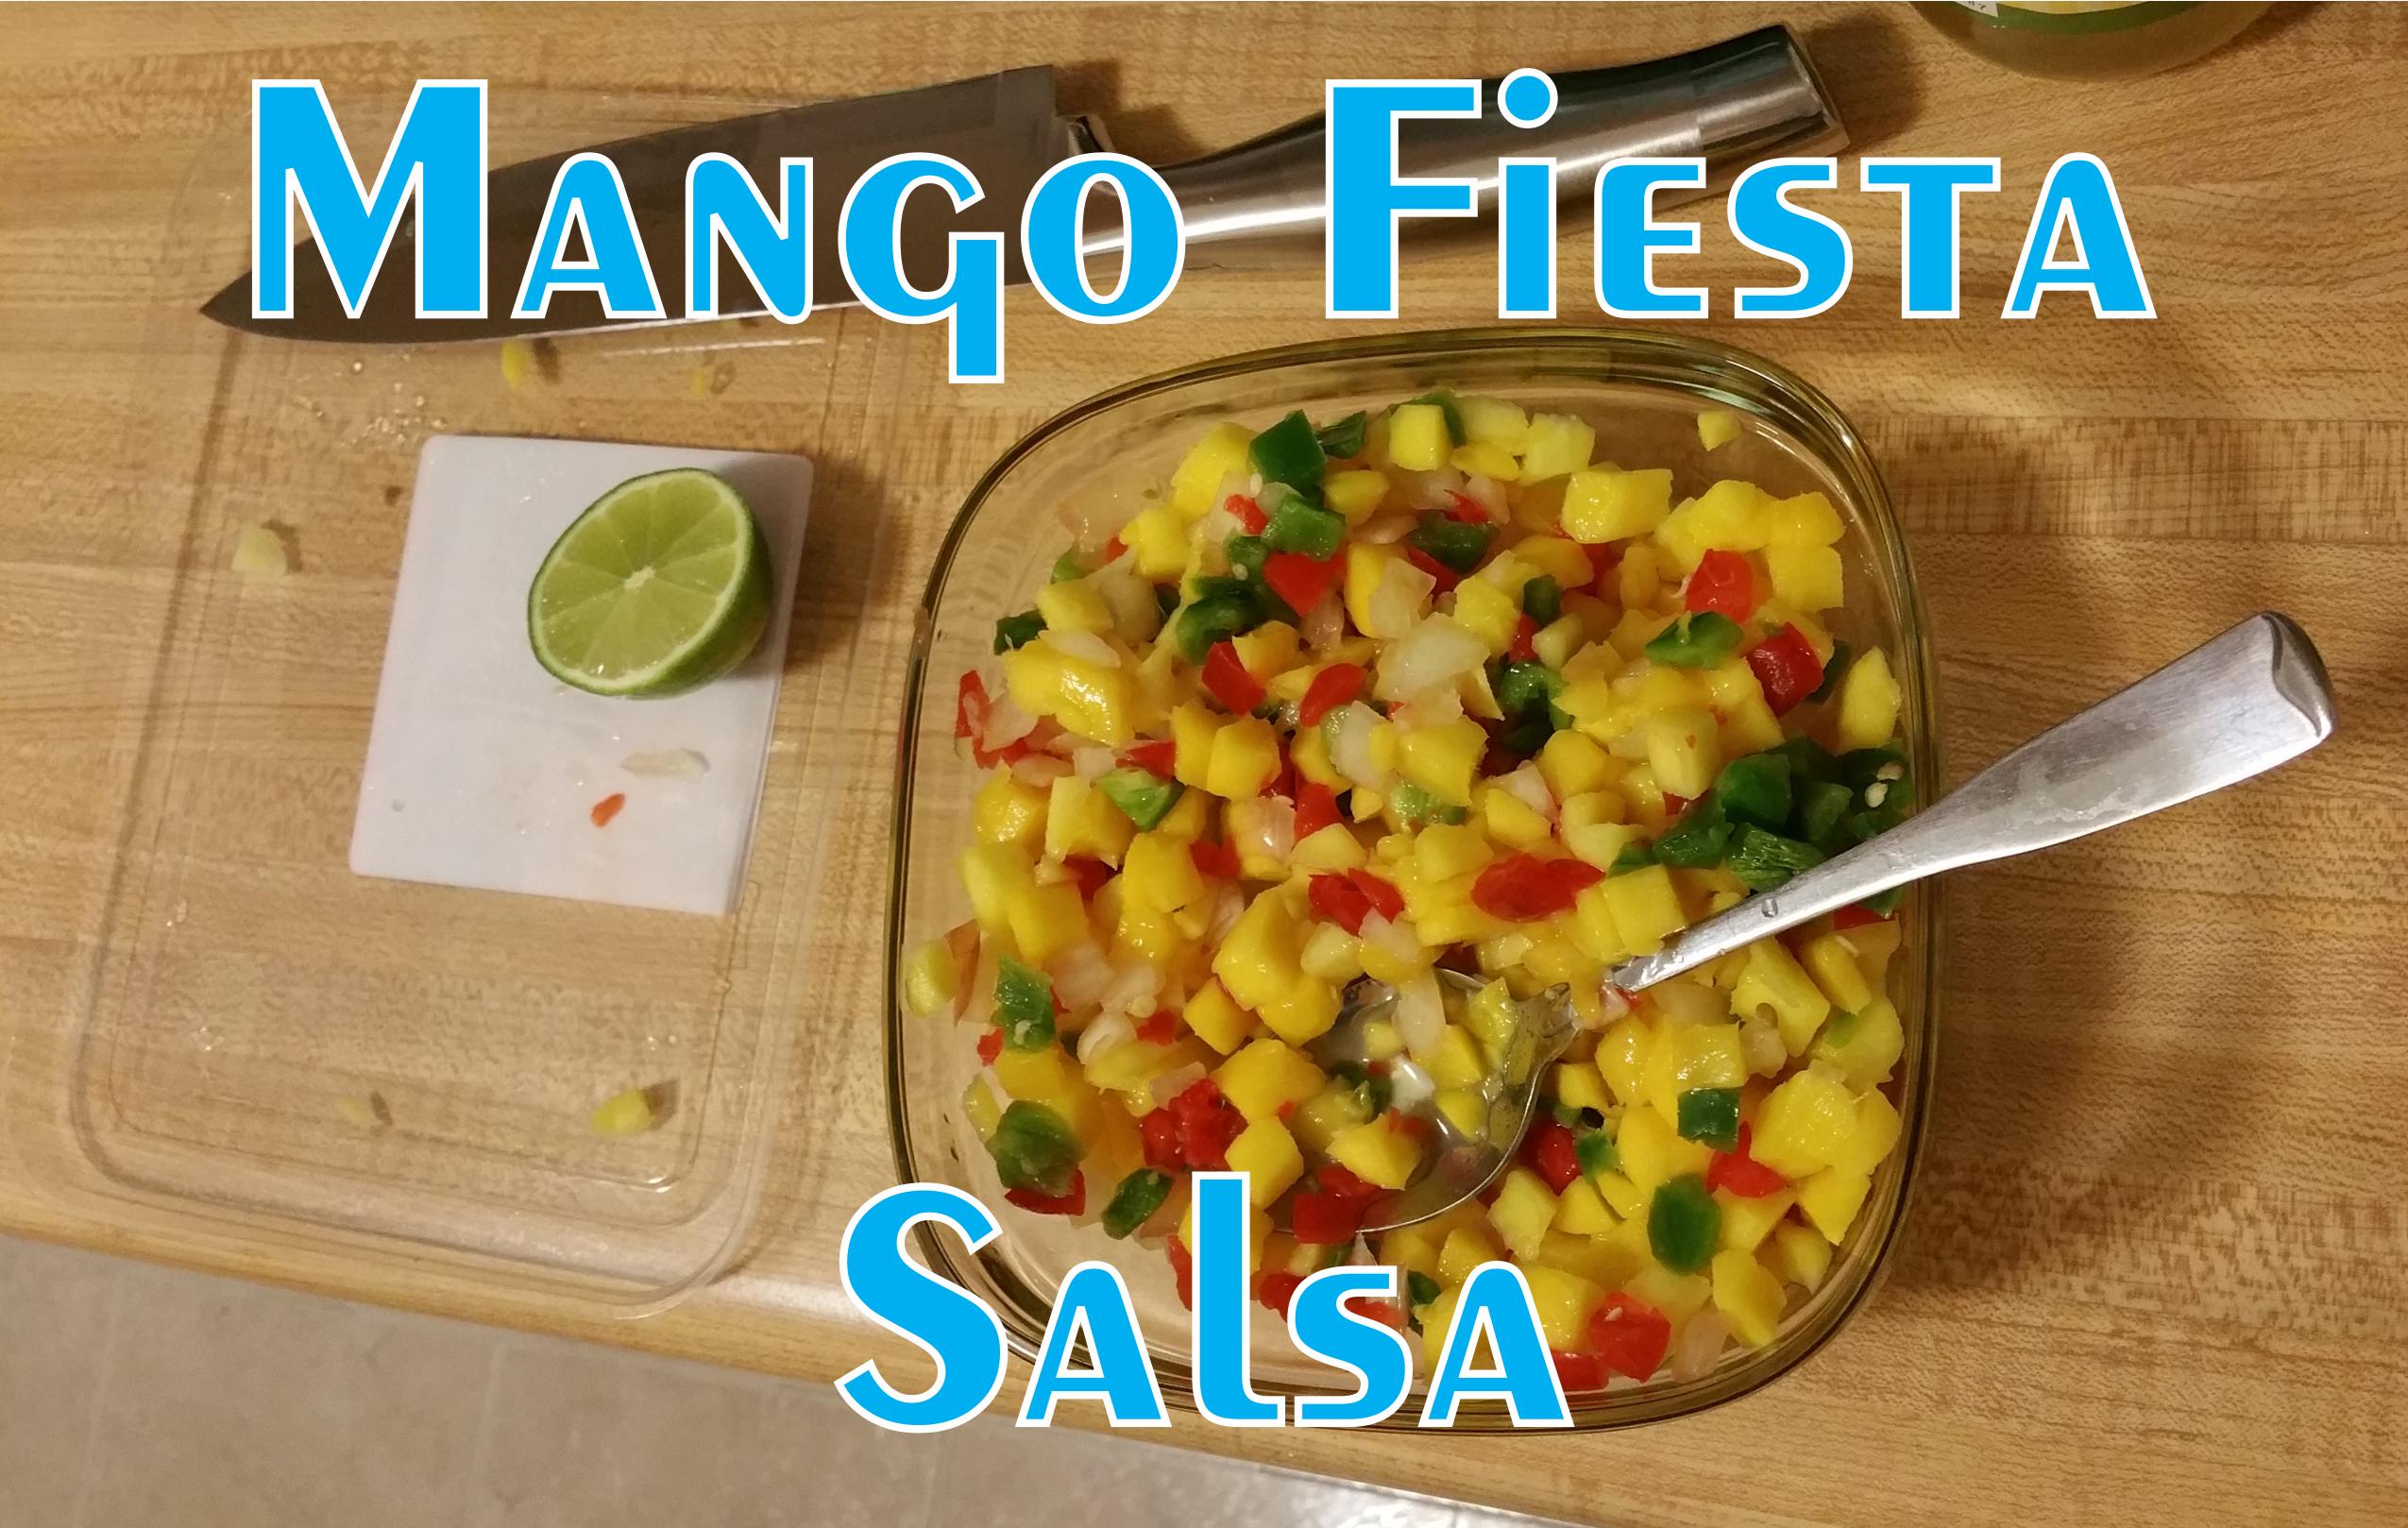 Mango Fiesta Salsa